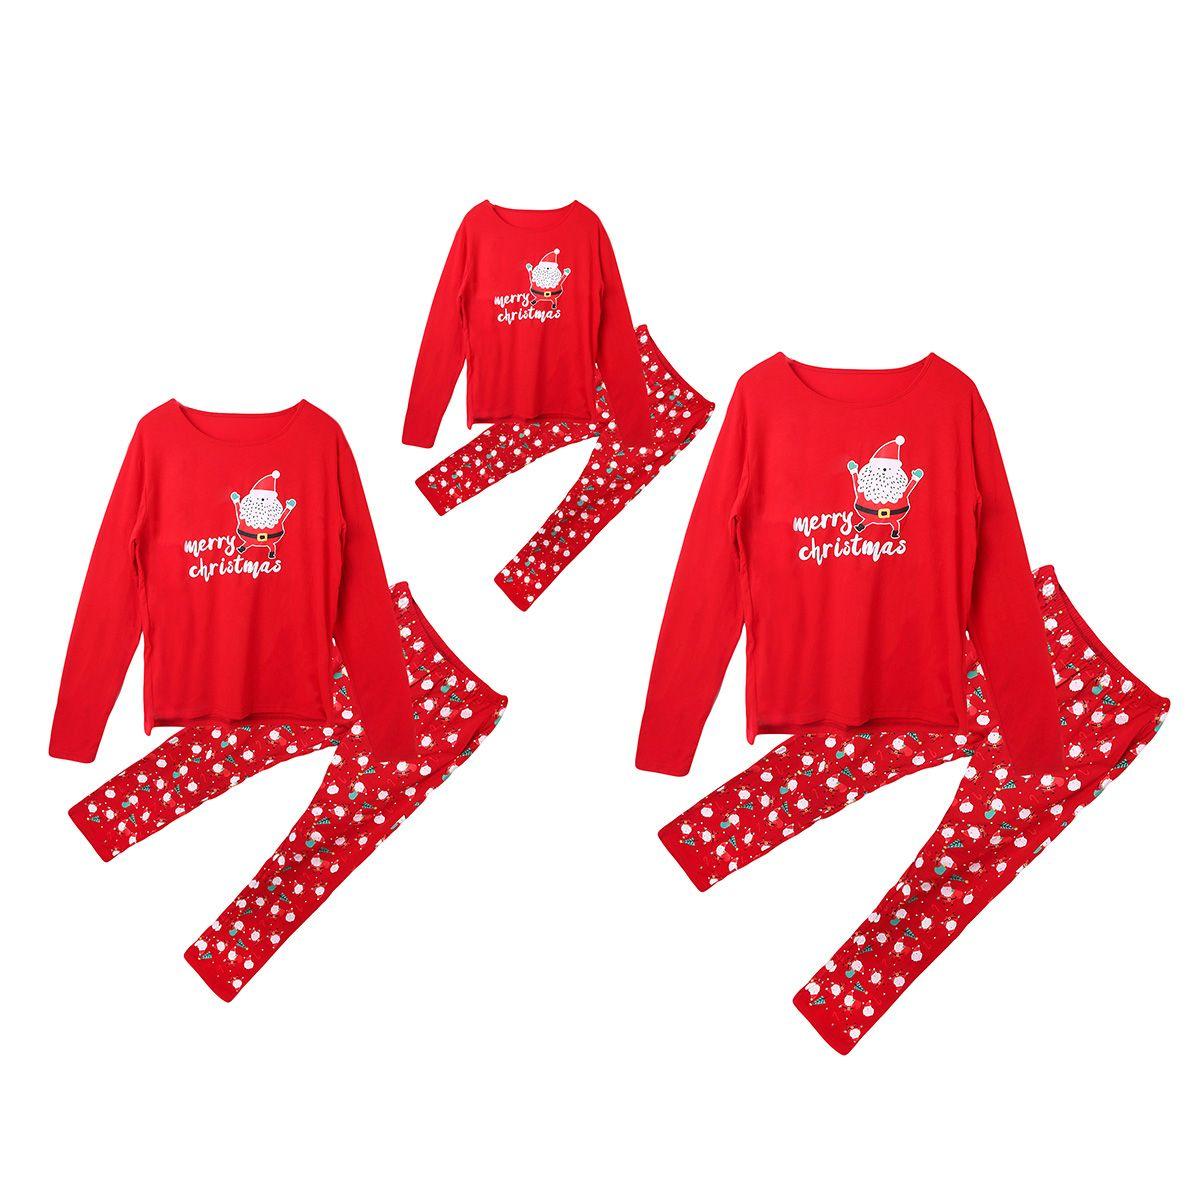 Emmababy Família Natal Pijamas Família Combinando Roupas Set Pijama Set Xmas Pijamas Roupa De Noite Natal Family Look